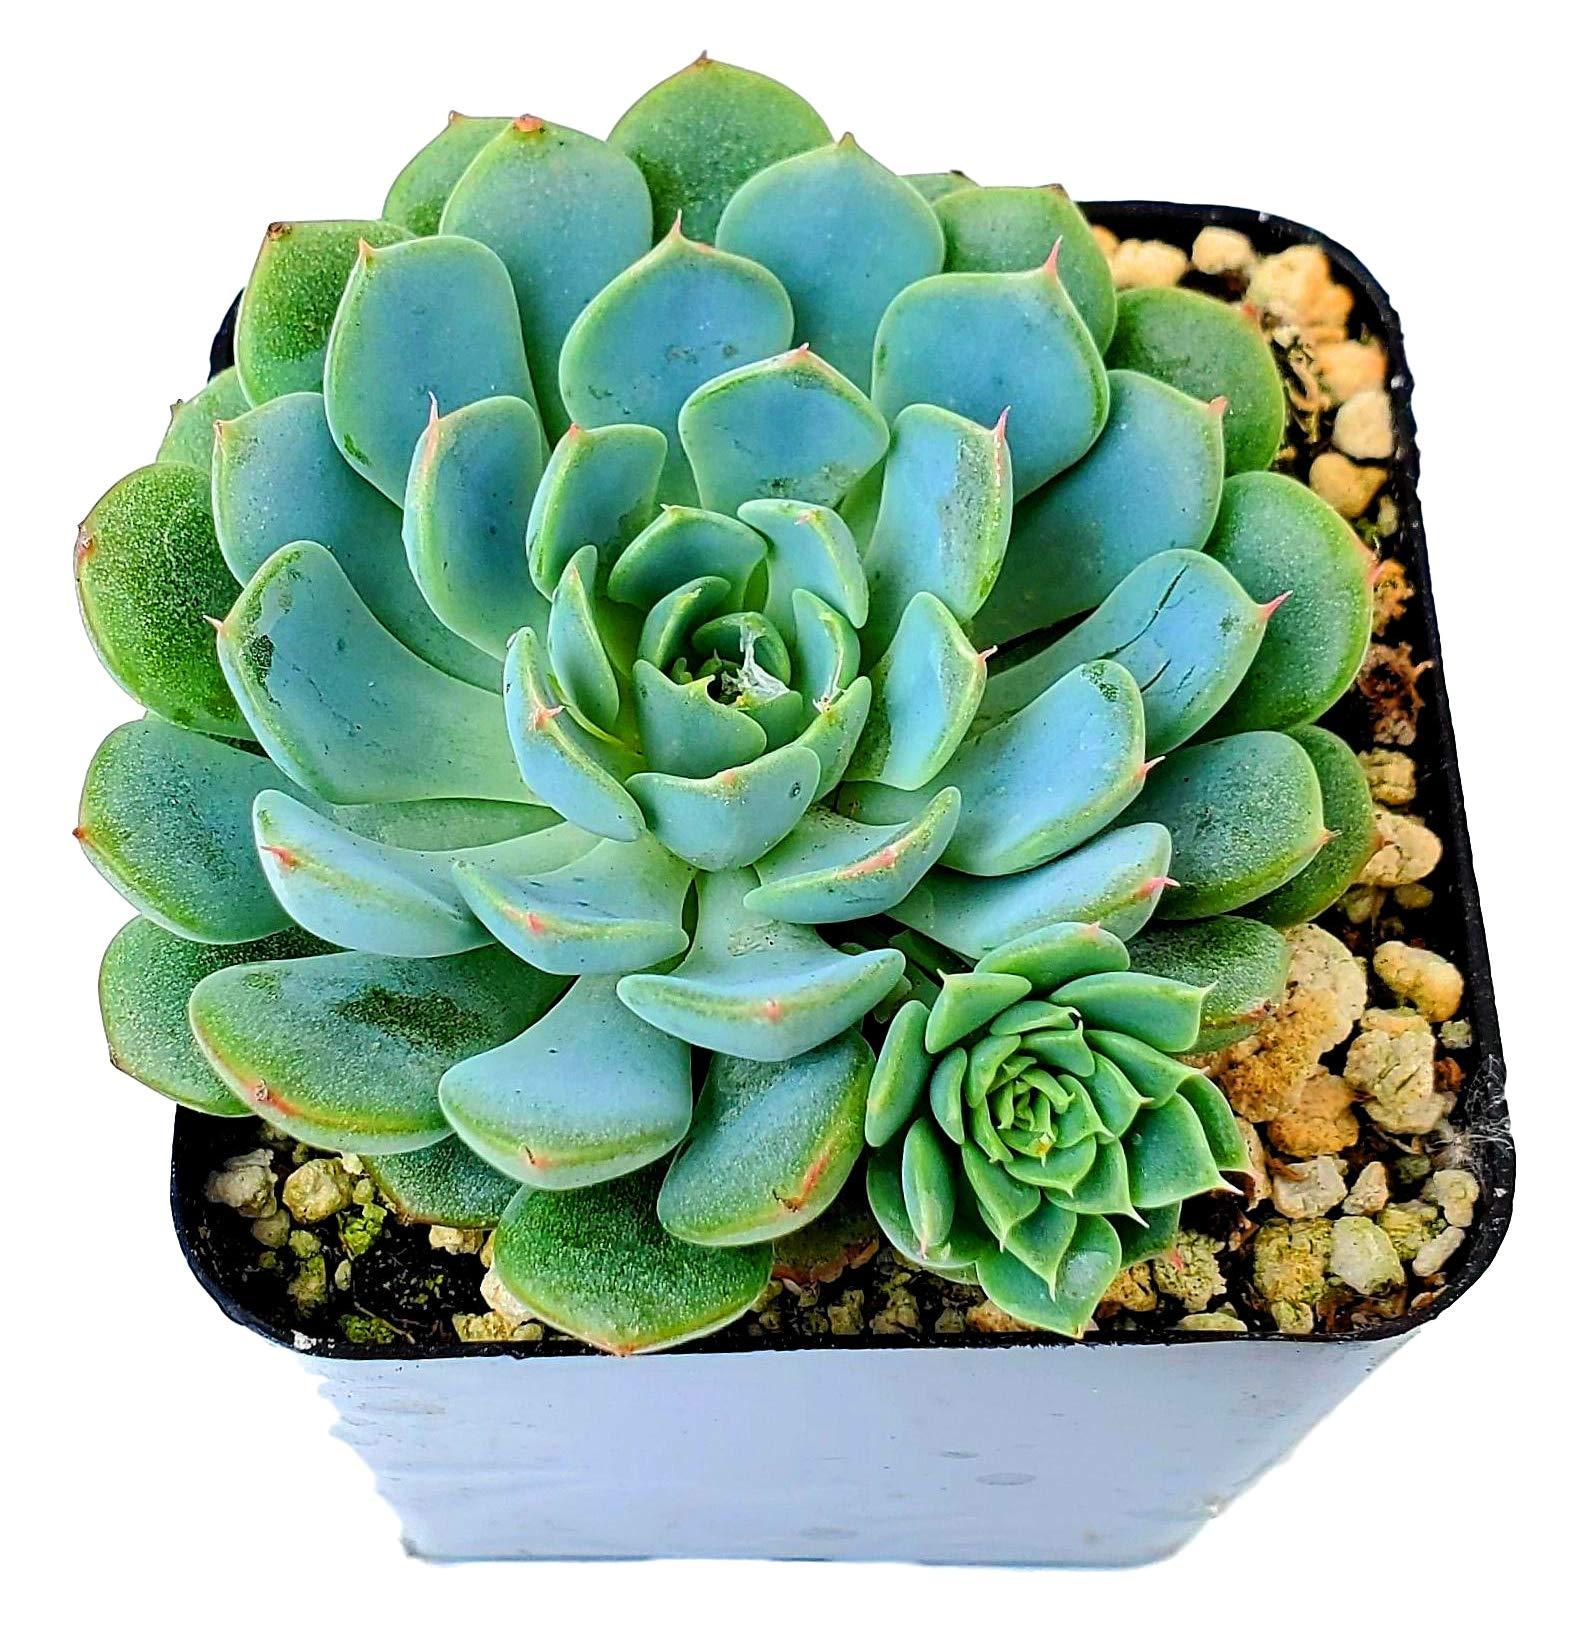 Fat Plants San Diego Live Echeveria Succulent Plant in a 4 inch Plastic Growers Pot (2.5 inch, Minima Hybrid)